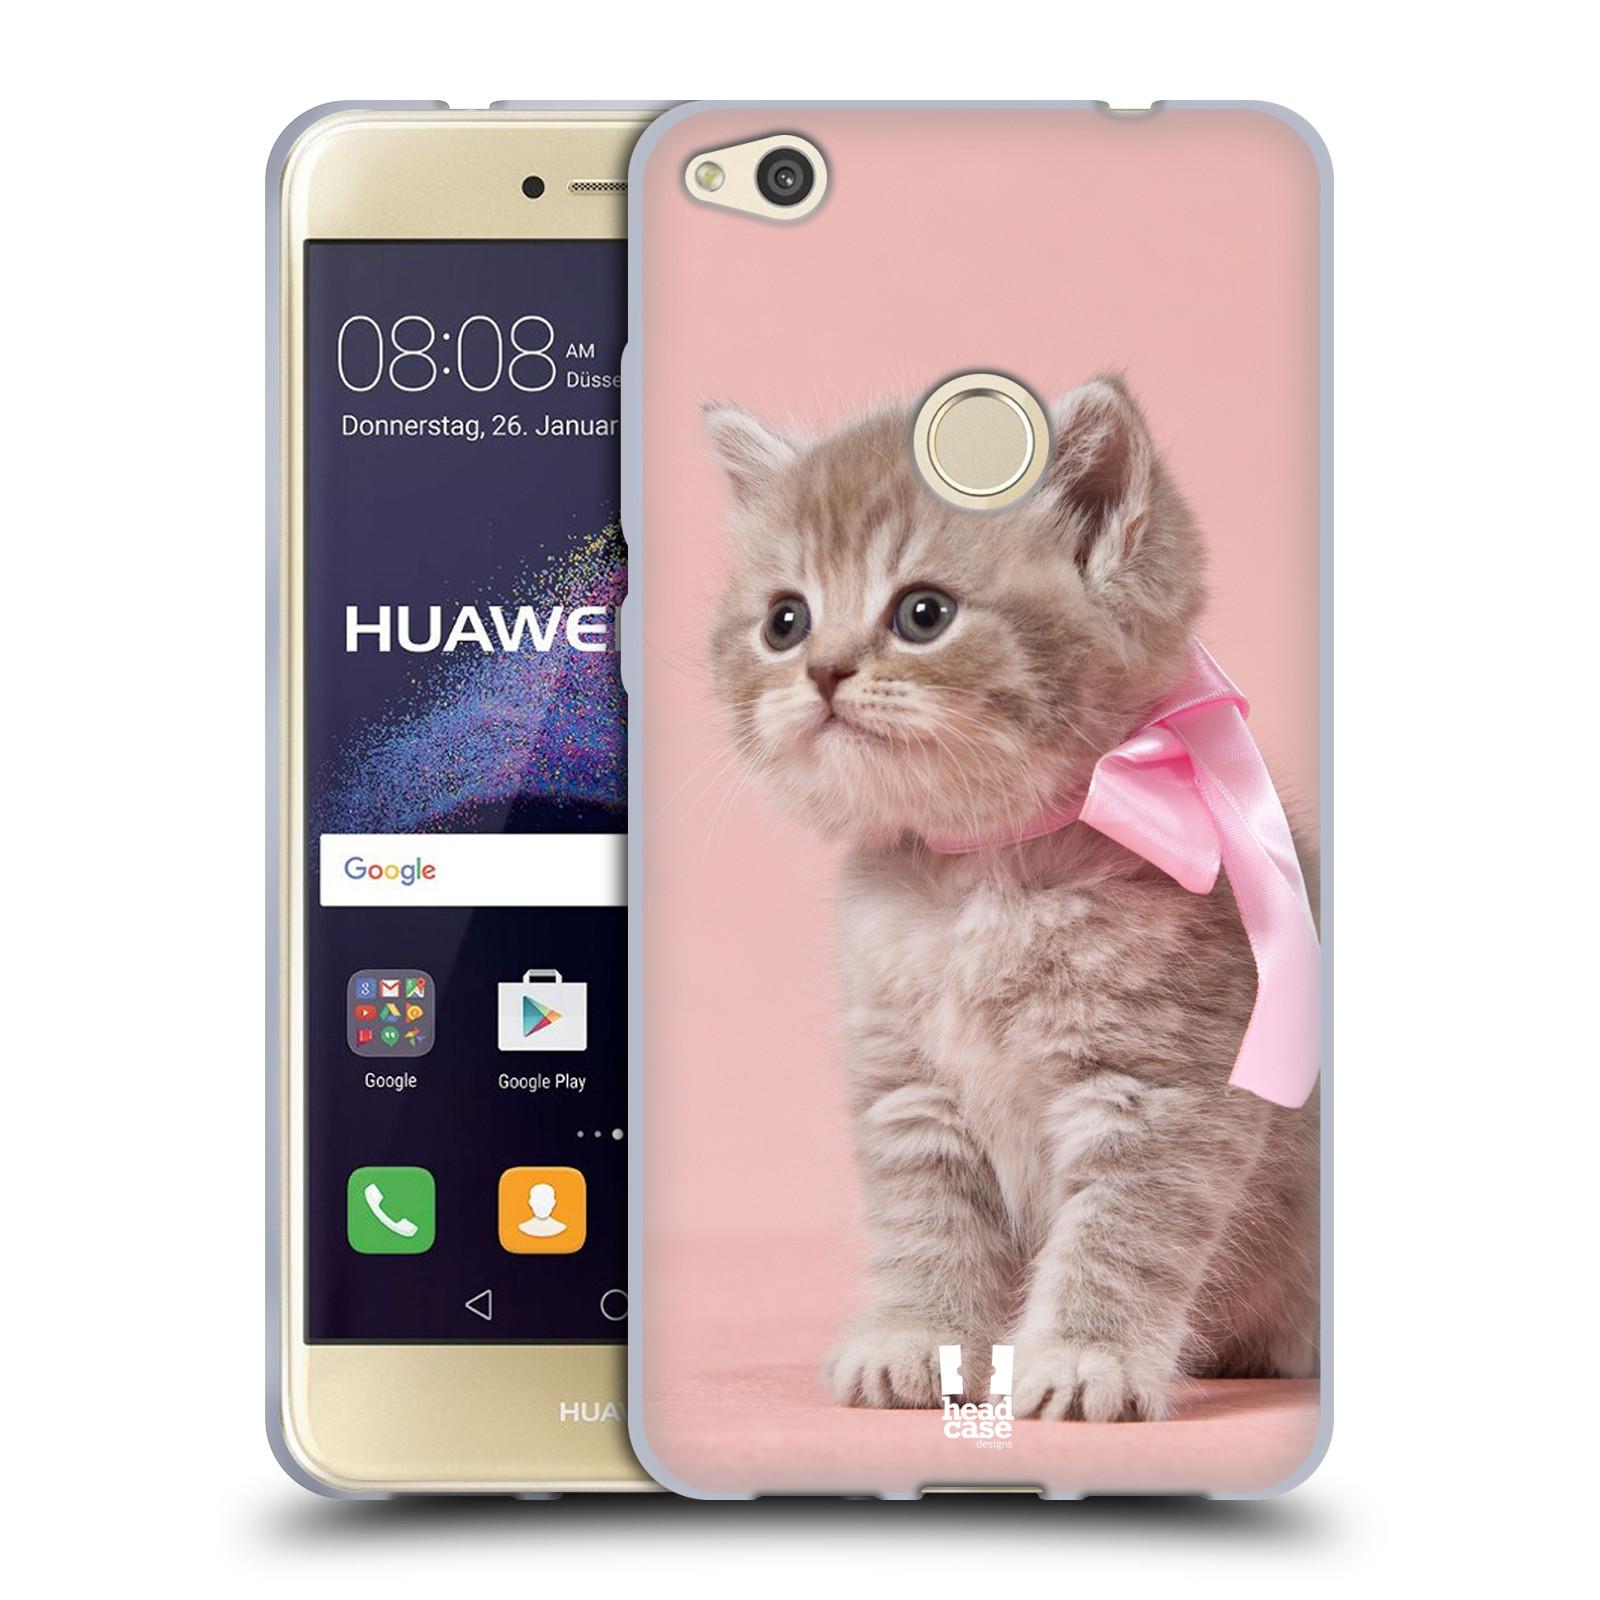 custodia huawei mate s gatto